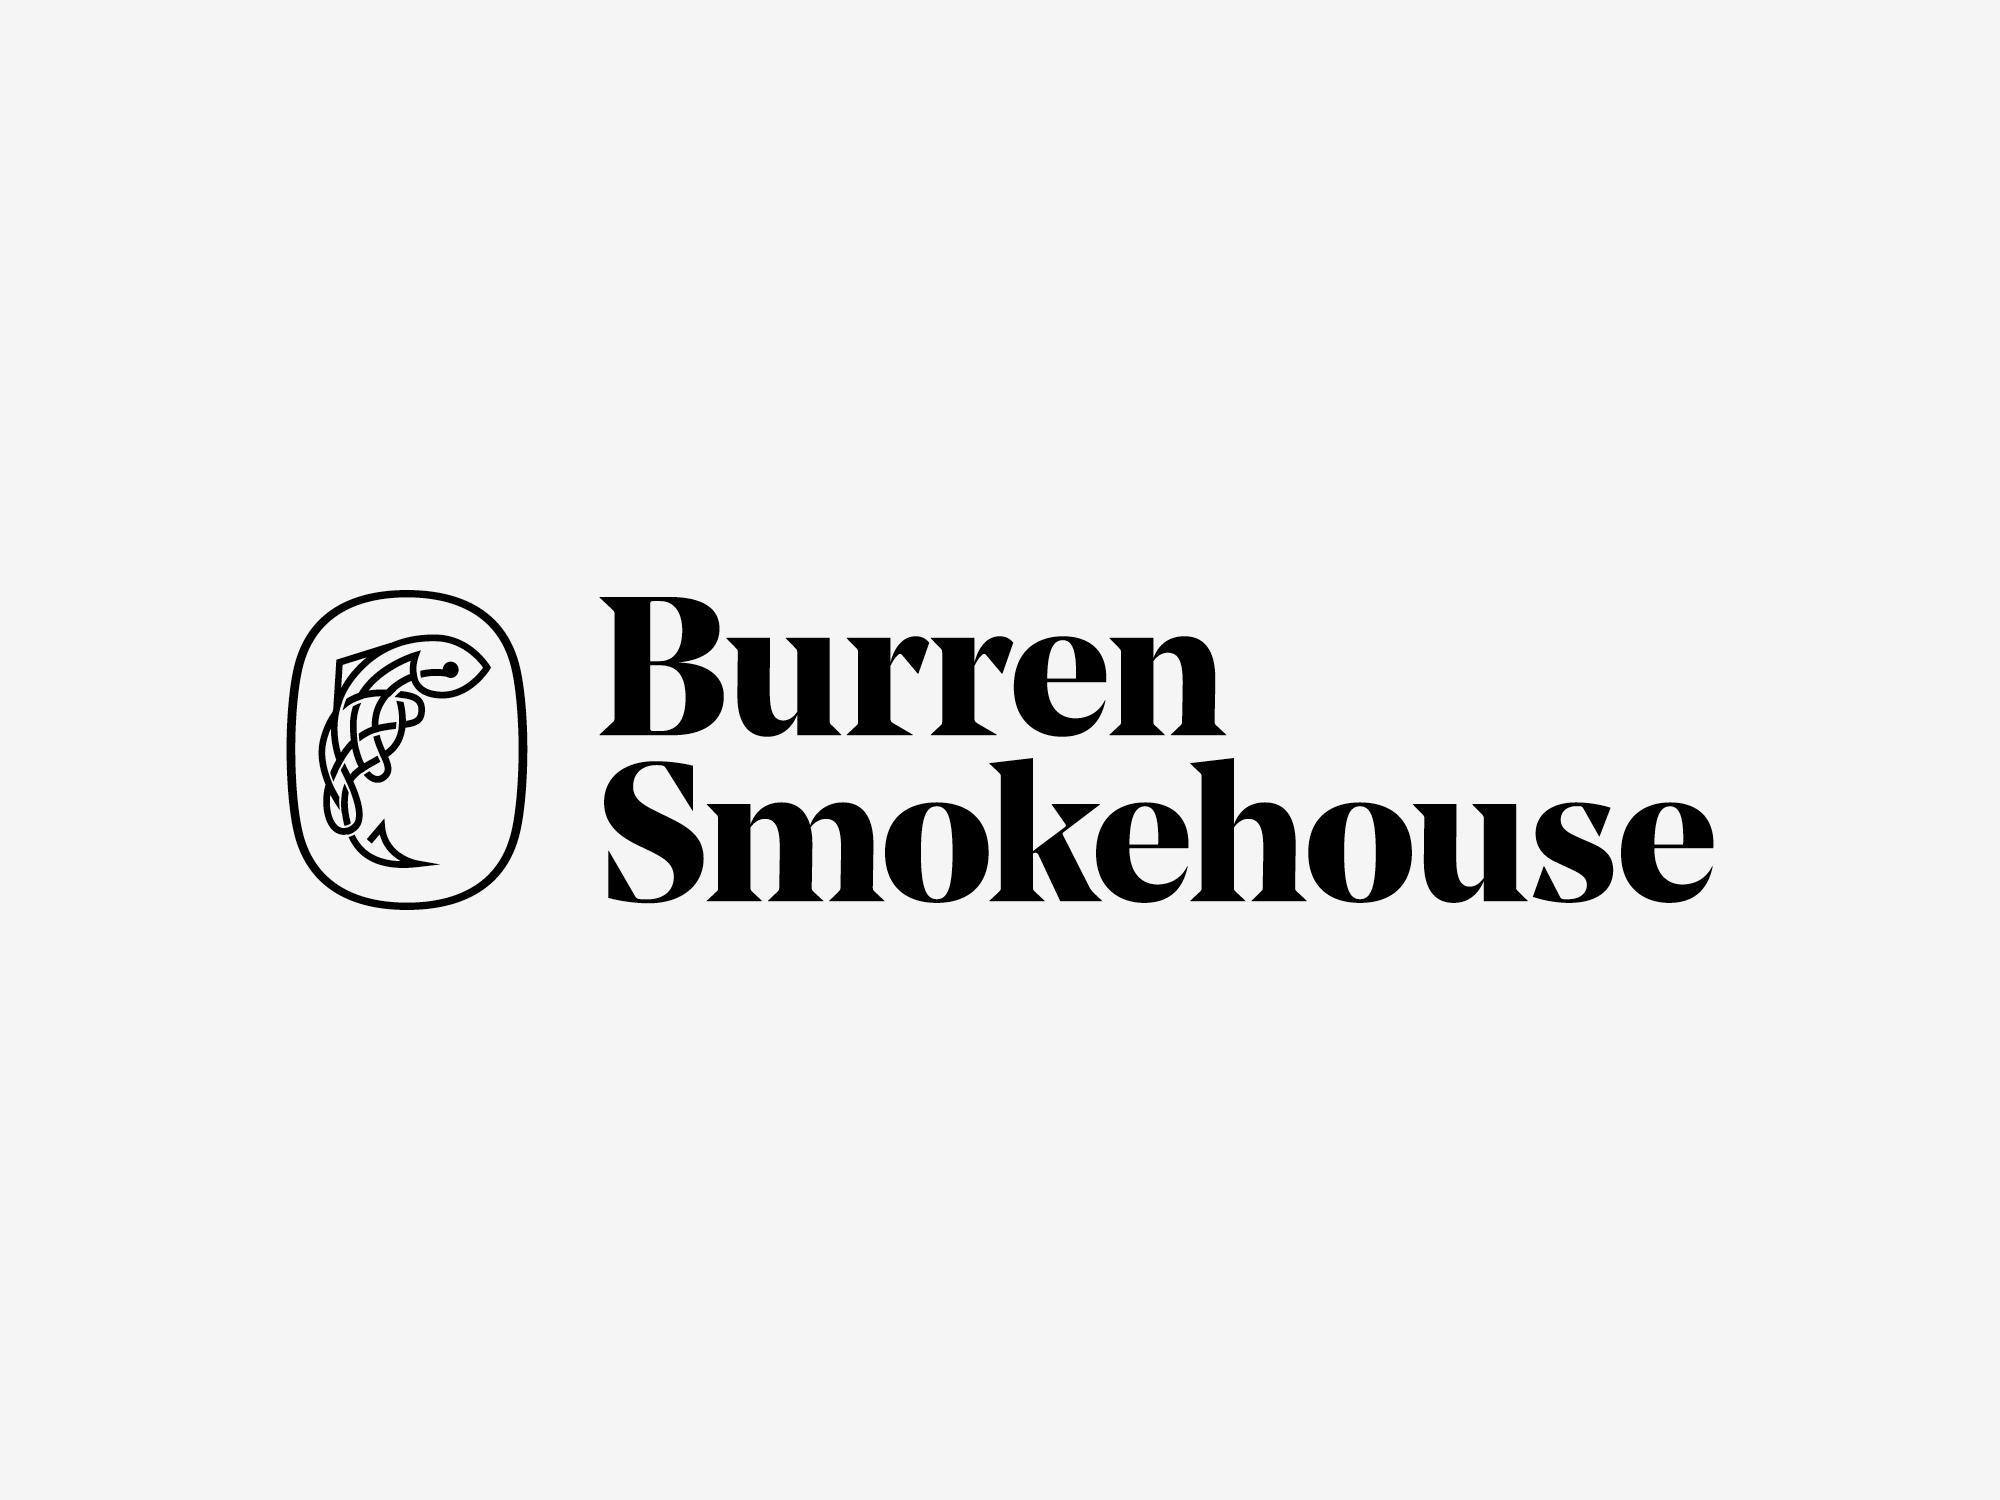 Cover image: Burren Smokehouse Rebrand